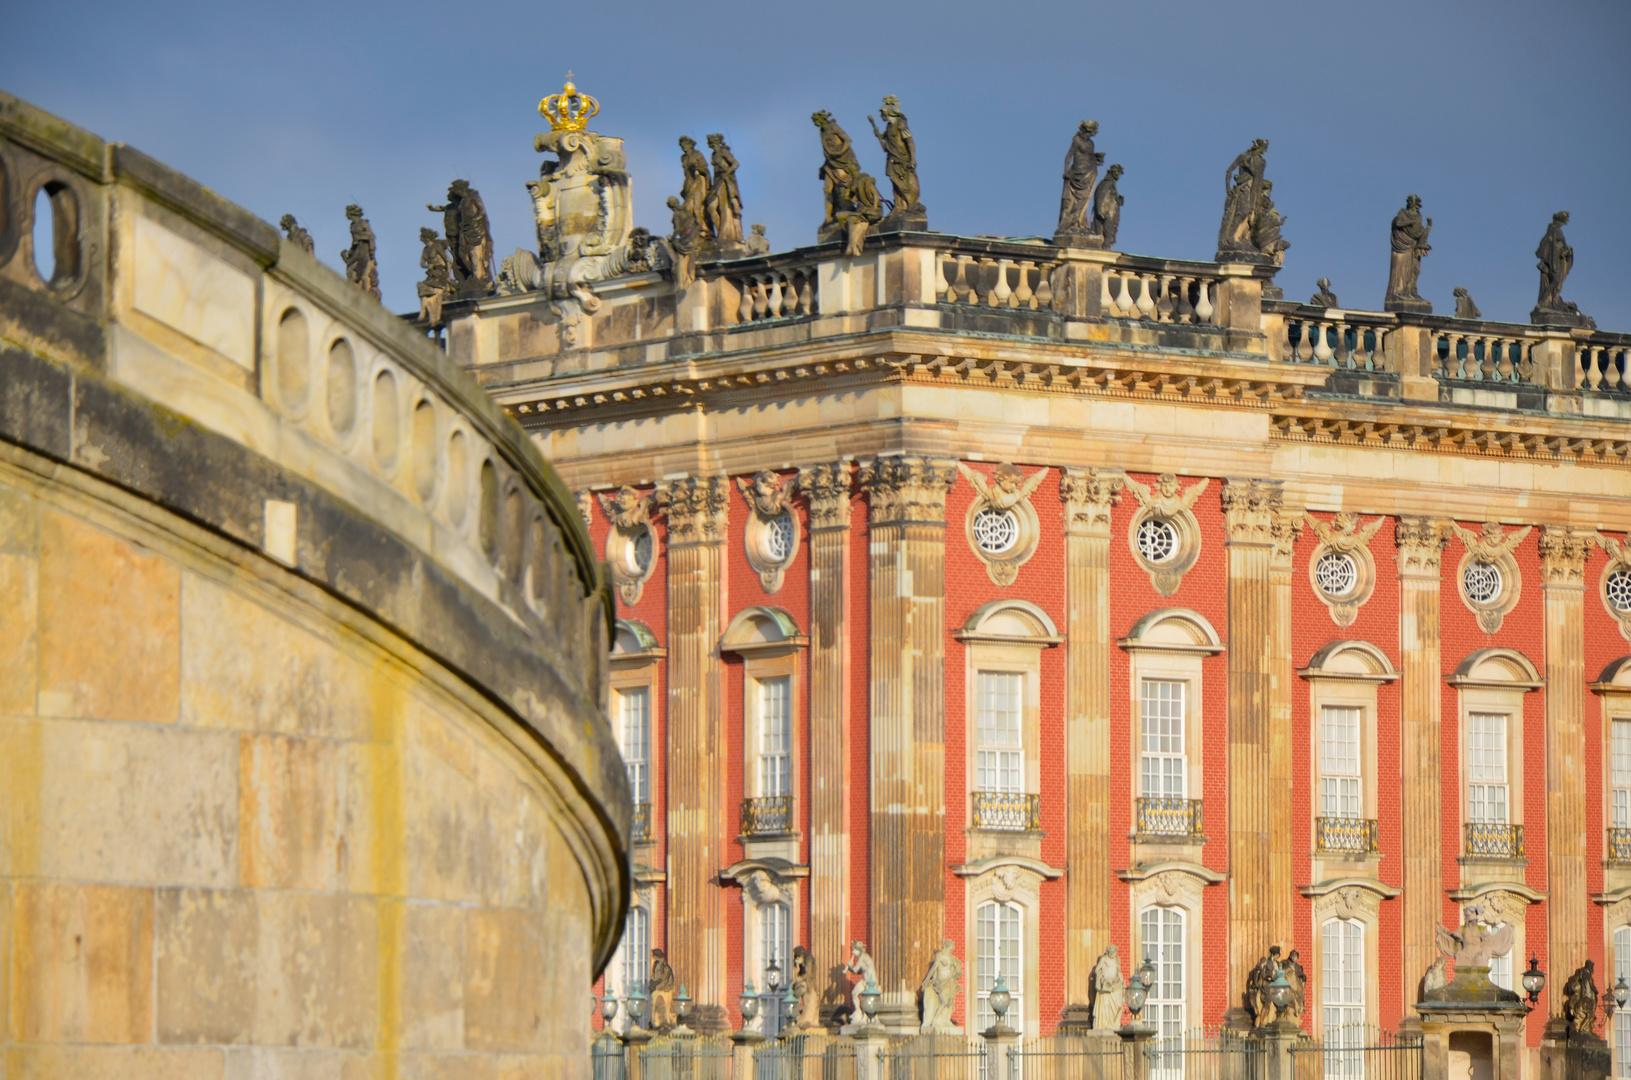 Neues Palais Potsdam, Detailansicht